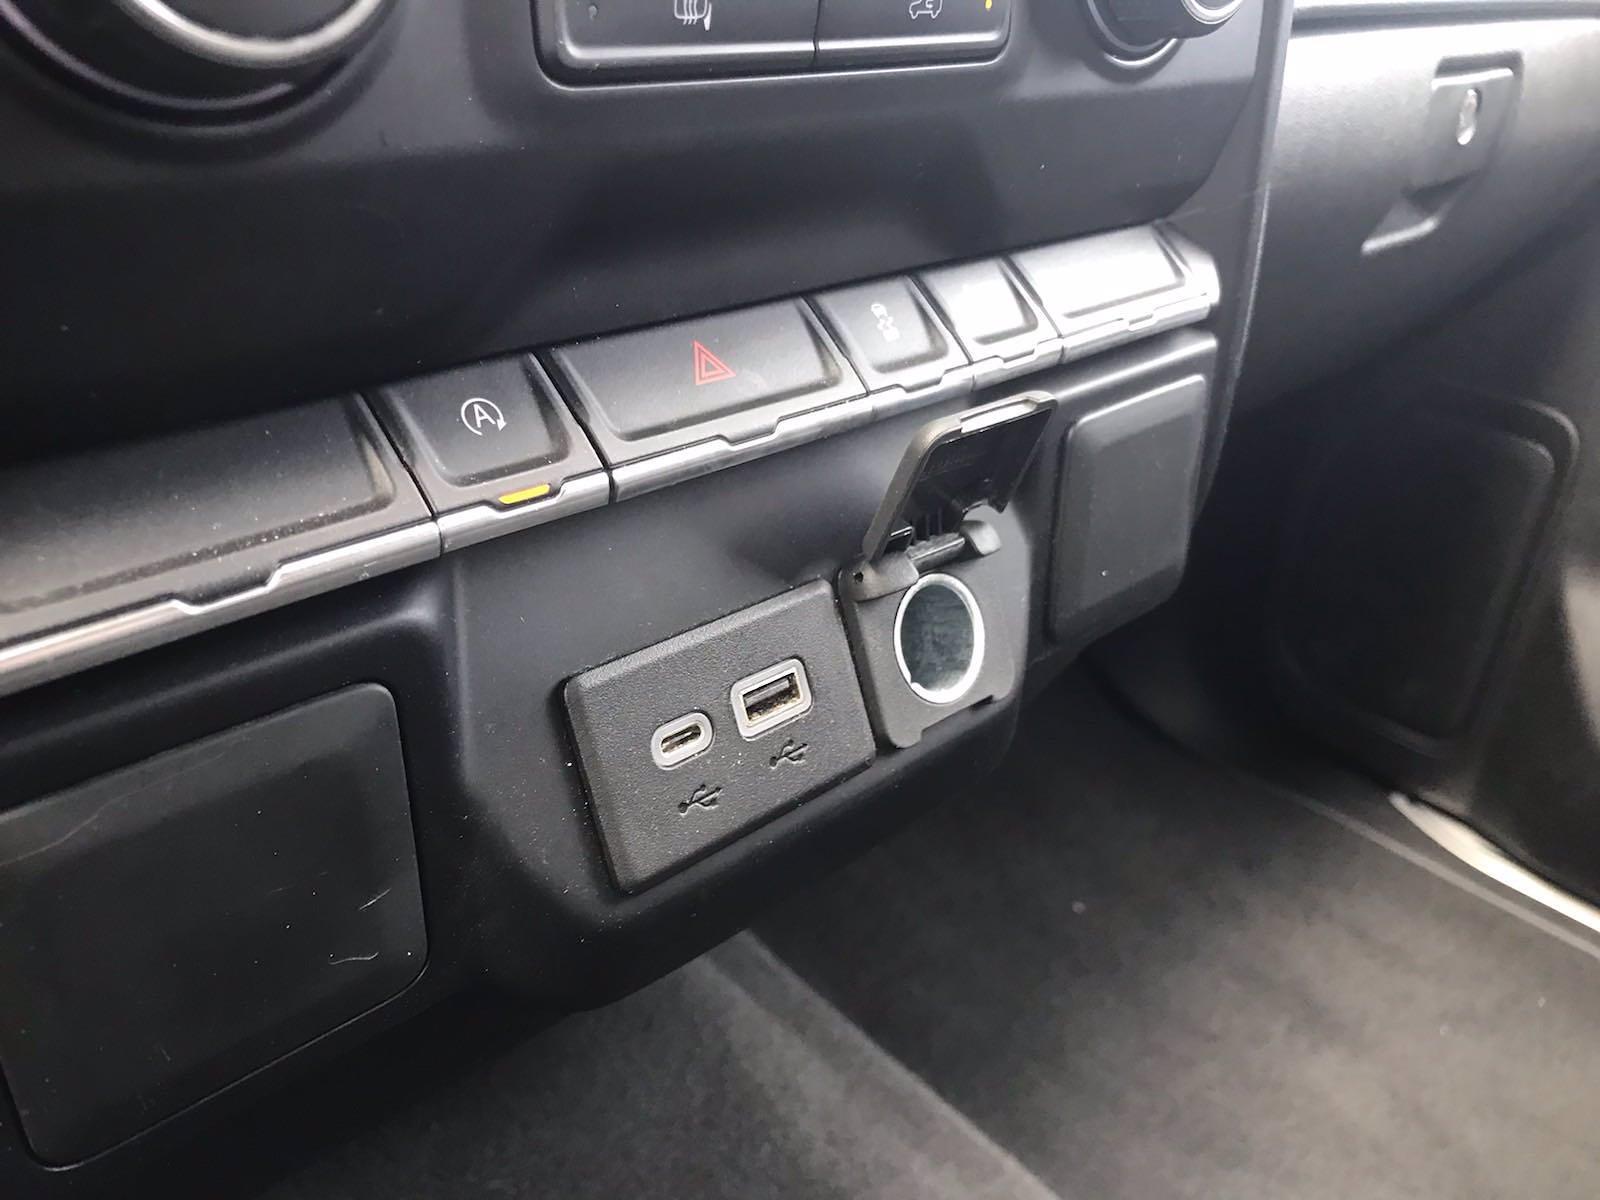 2020 Chevrolet Silverado 1500 Crew Cab 4x4, Pickup #16476PN - photo 34